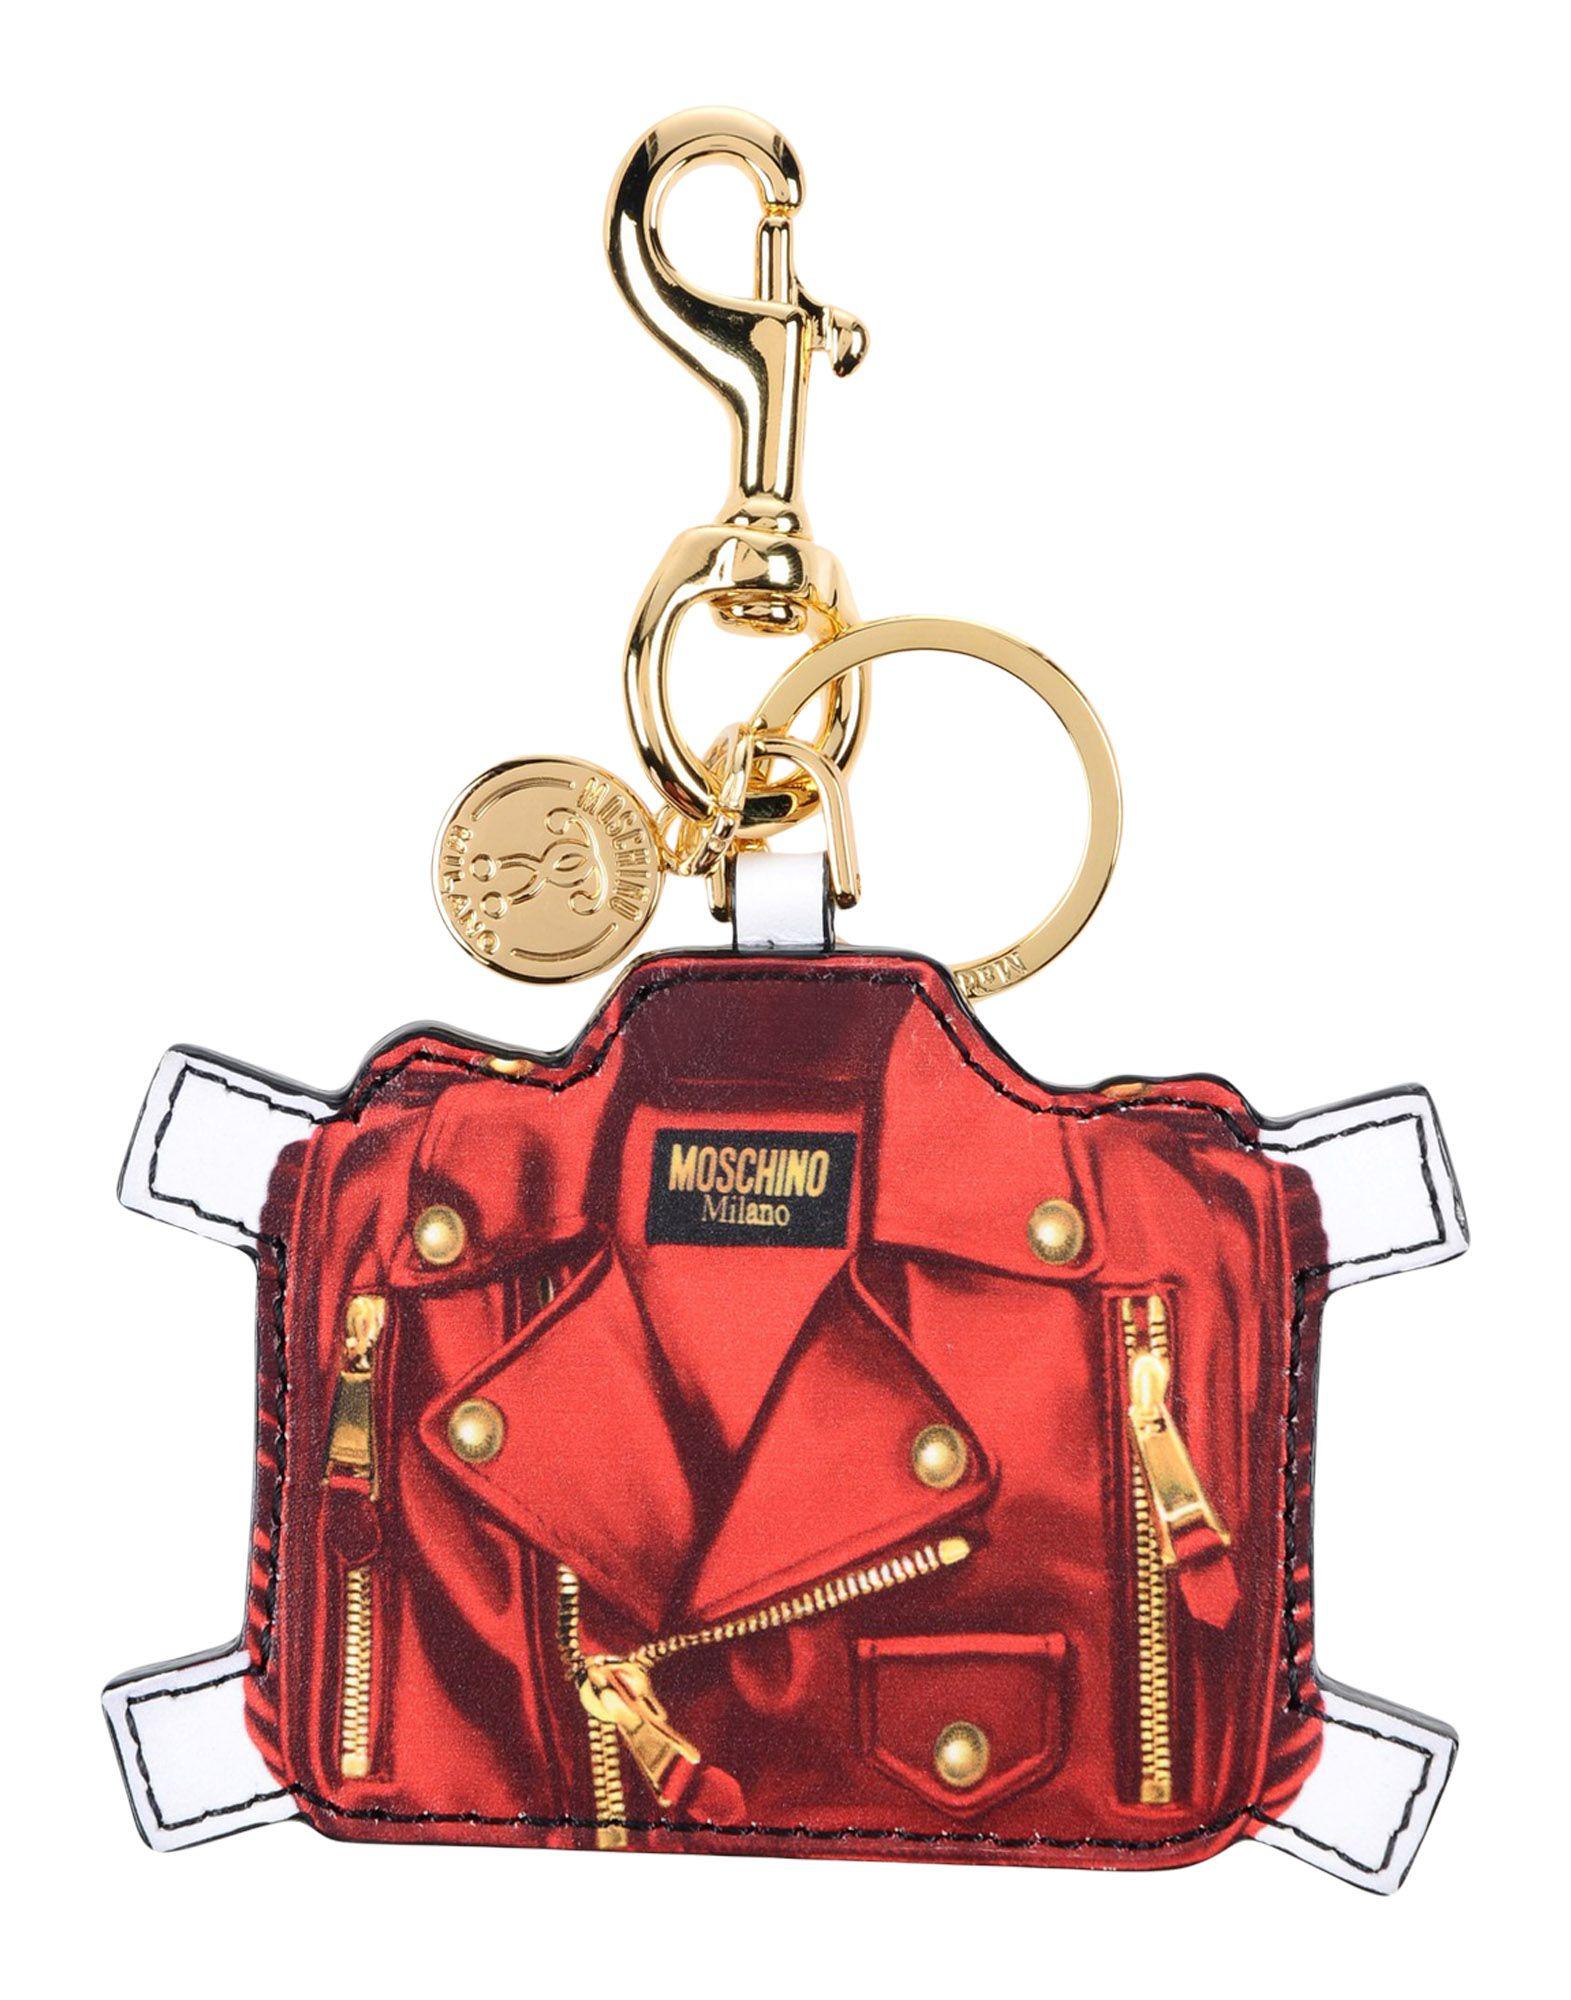 MOSCHINO Брелок для ключей брелок для сумочки и ключей русские подарки брелок для сумочки и ключей